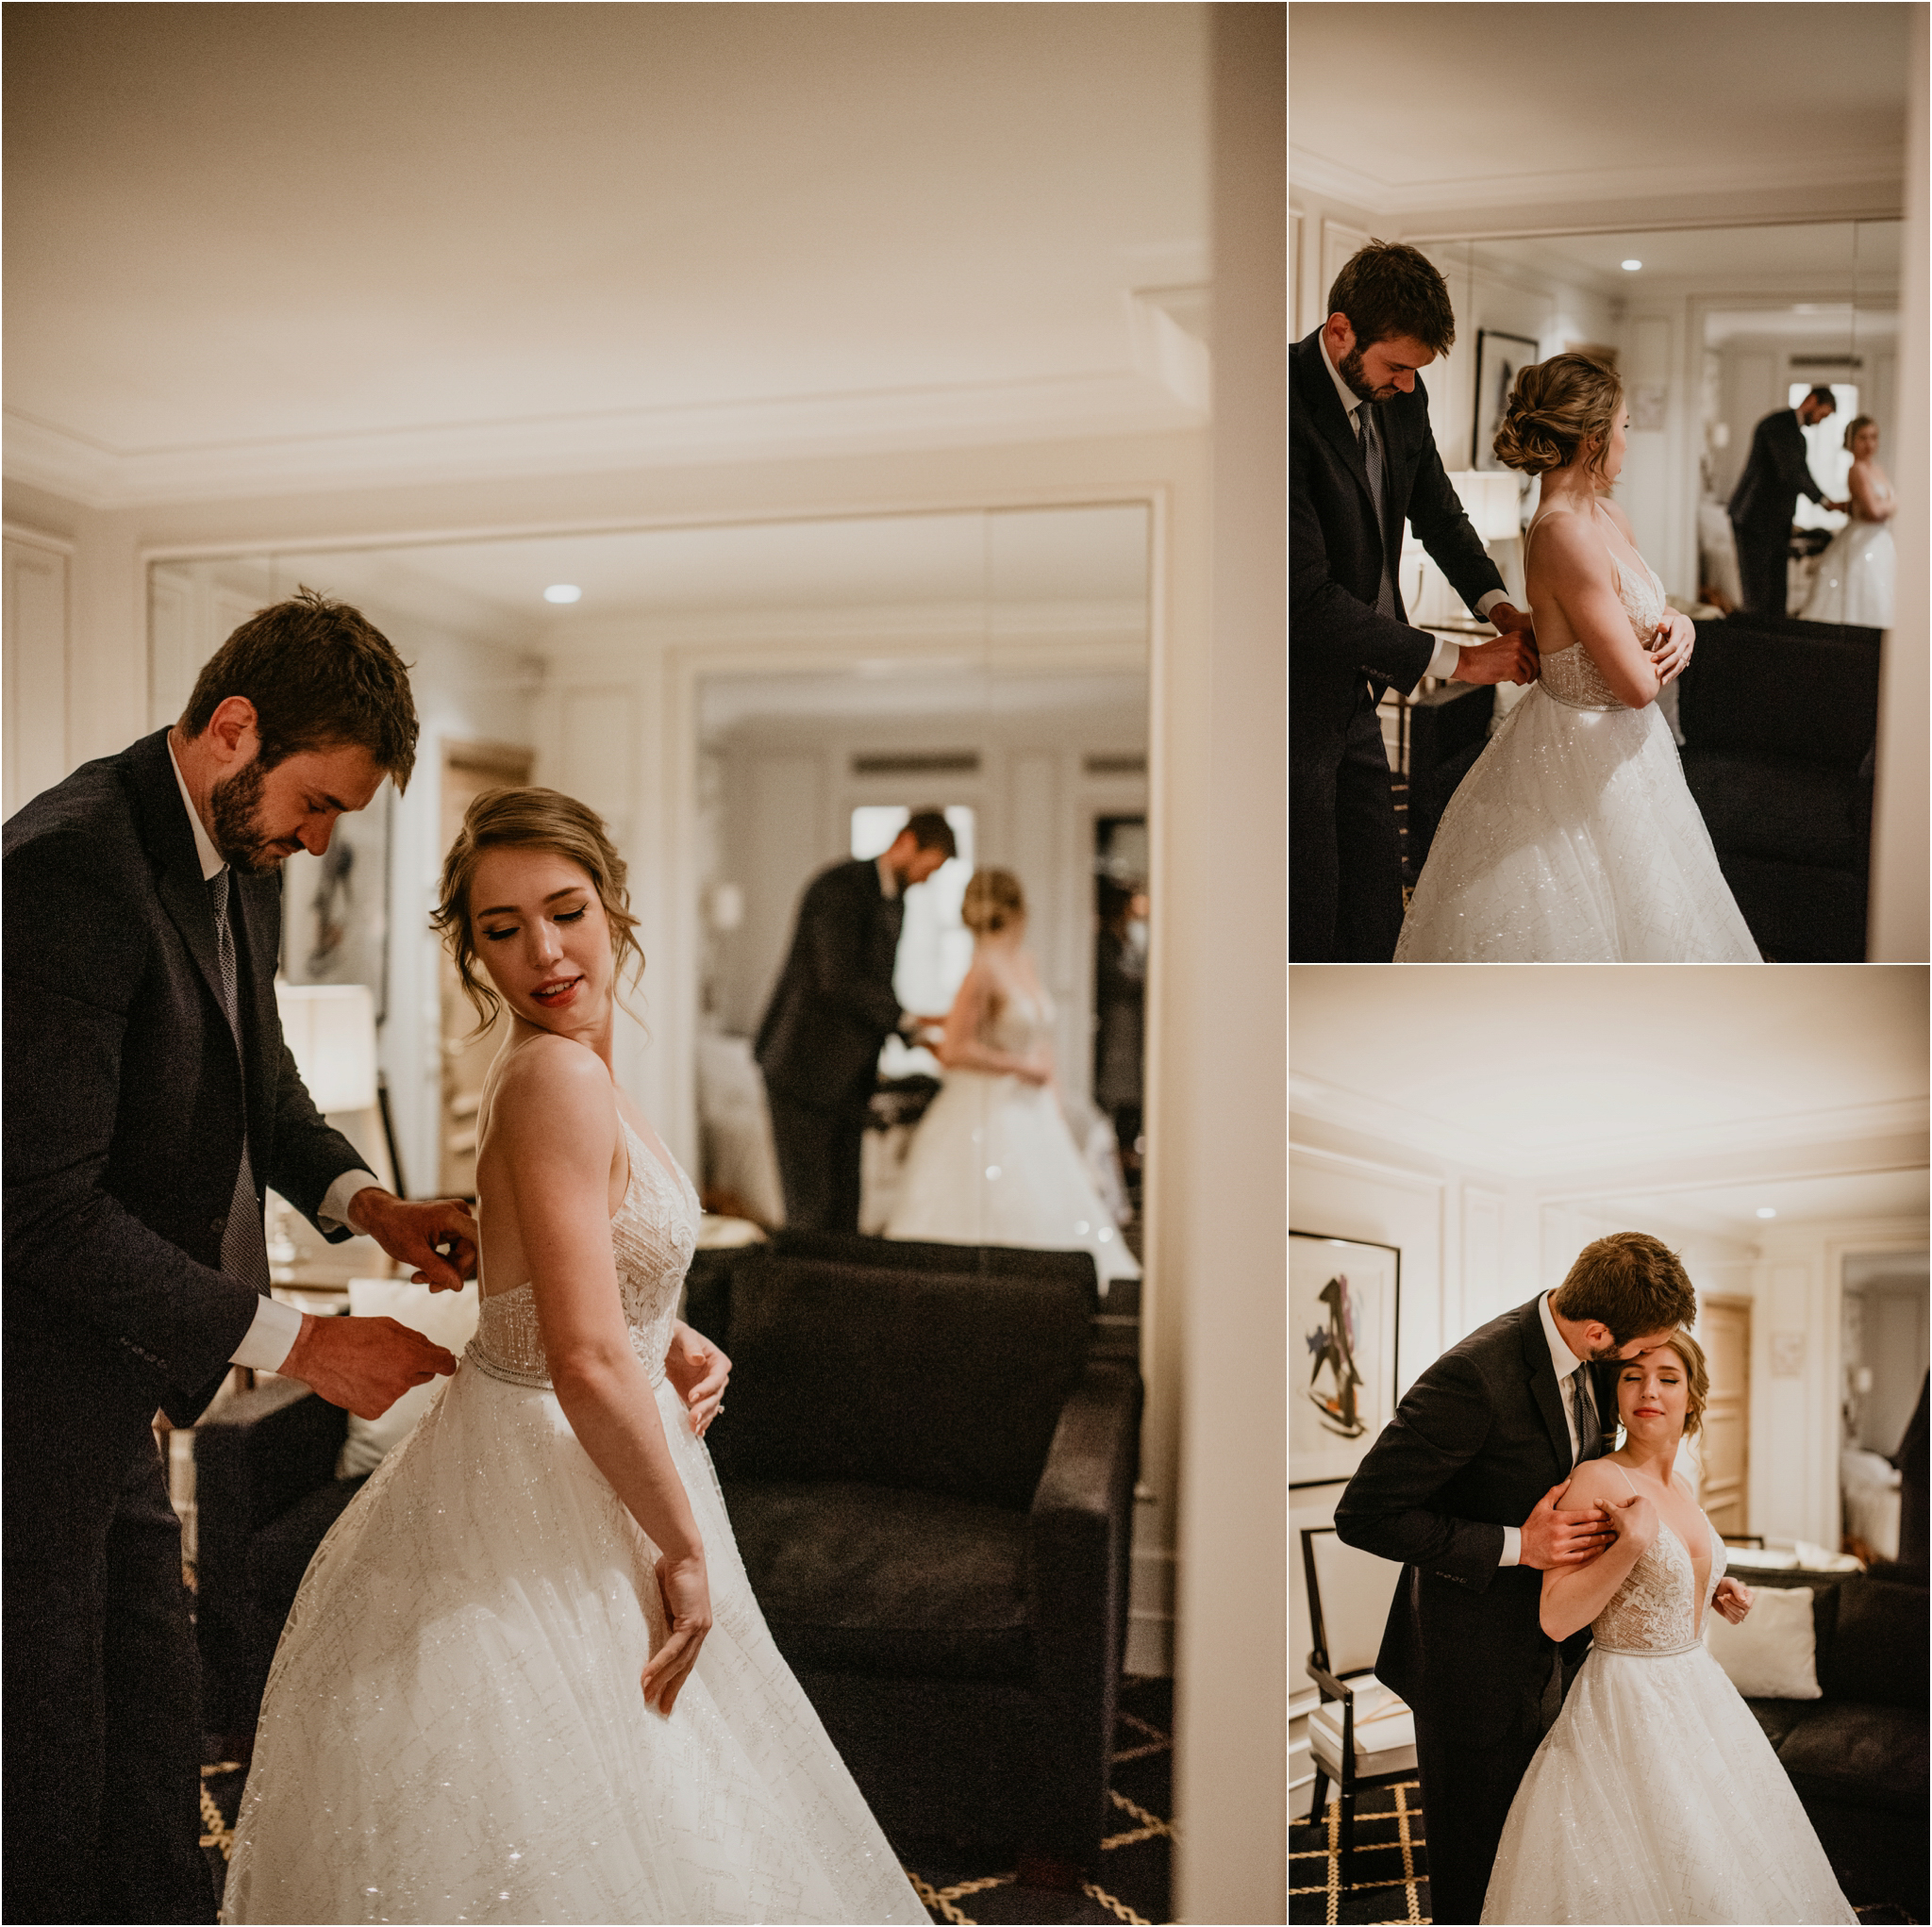 miranda-and-jared-paris-elopement-destination-wedding-photographer-015.jpg